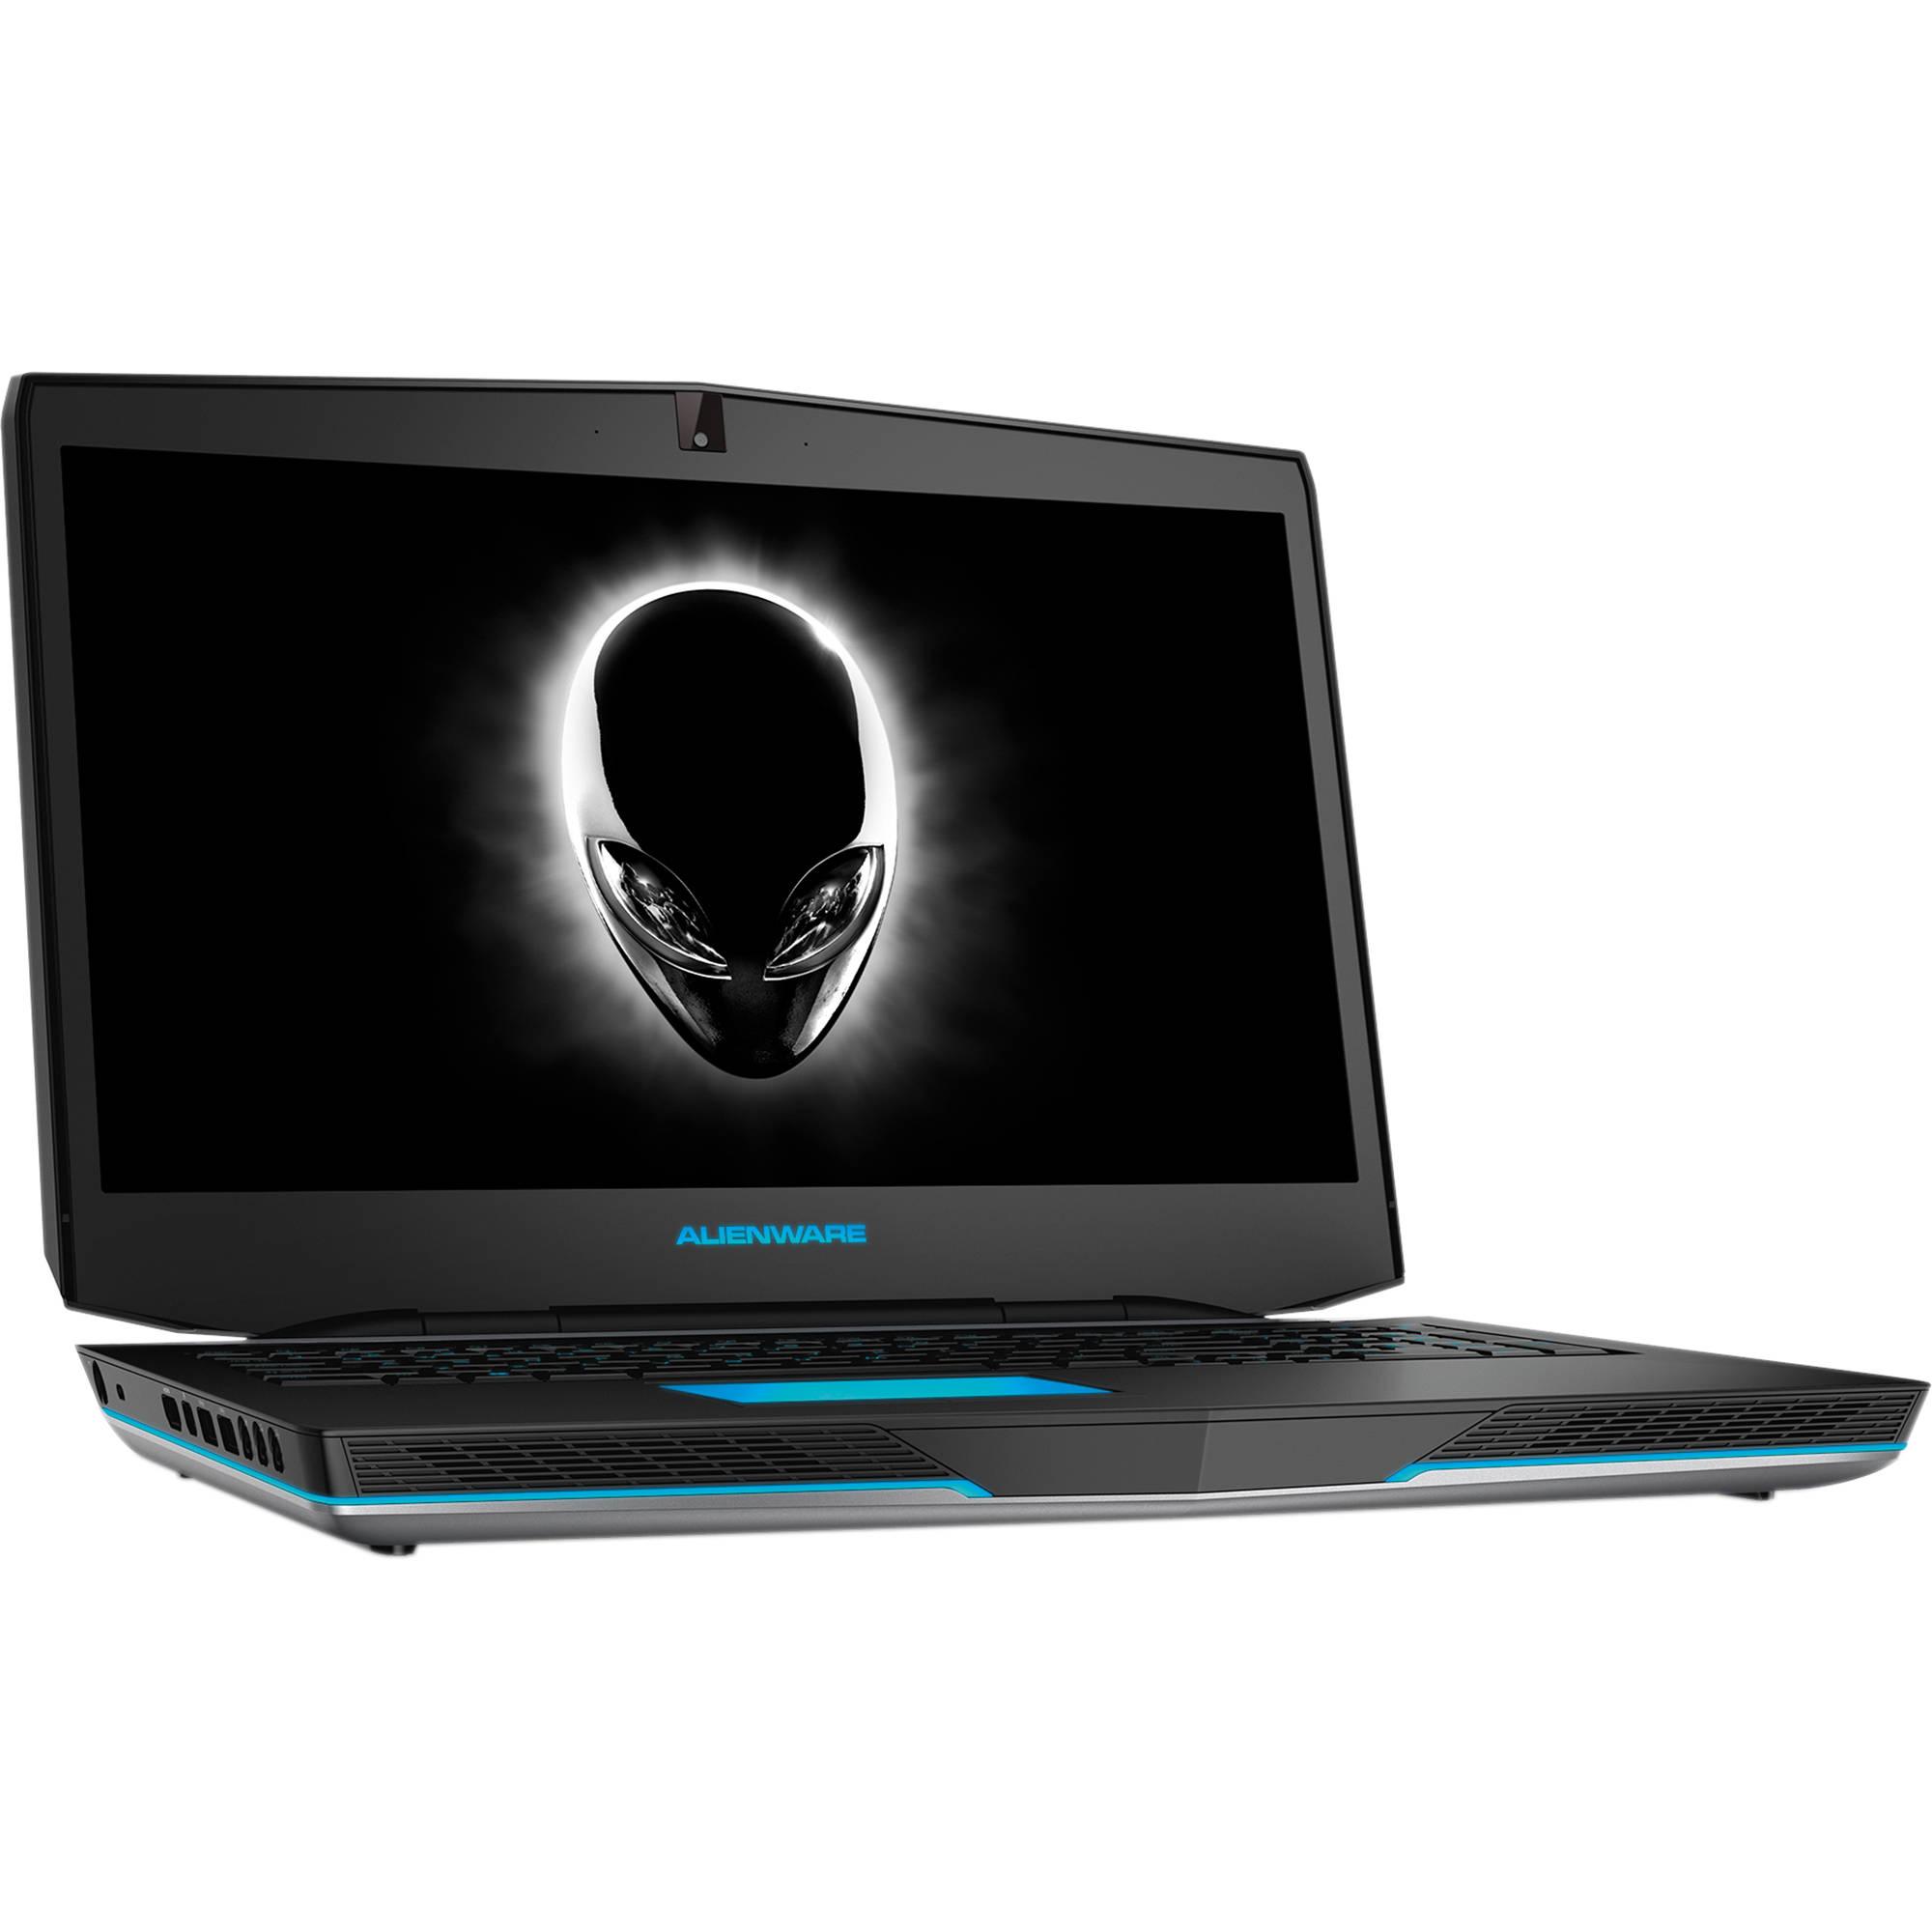 Dell Alienware 17 Gaming 17.3